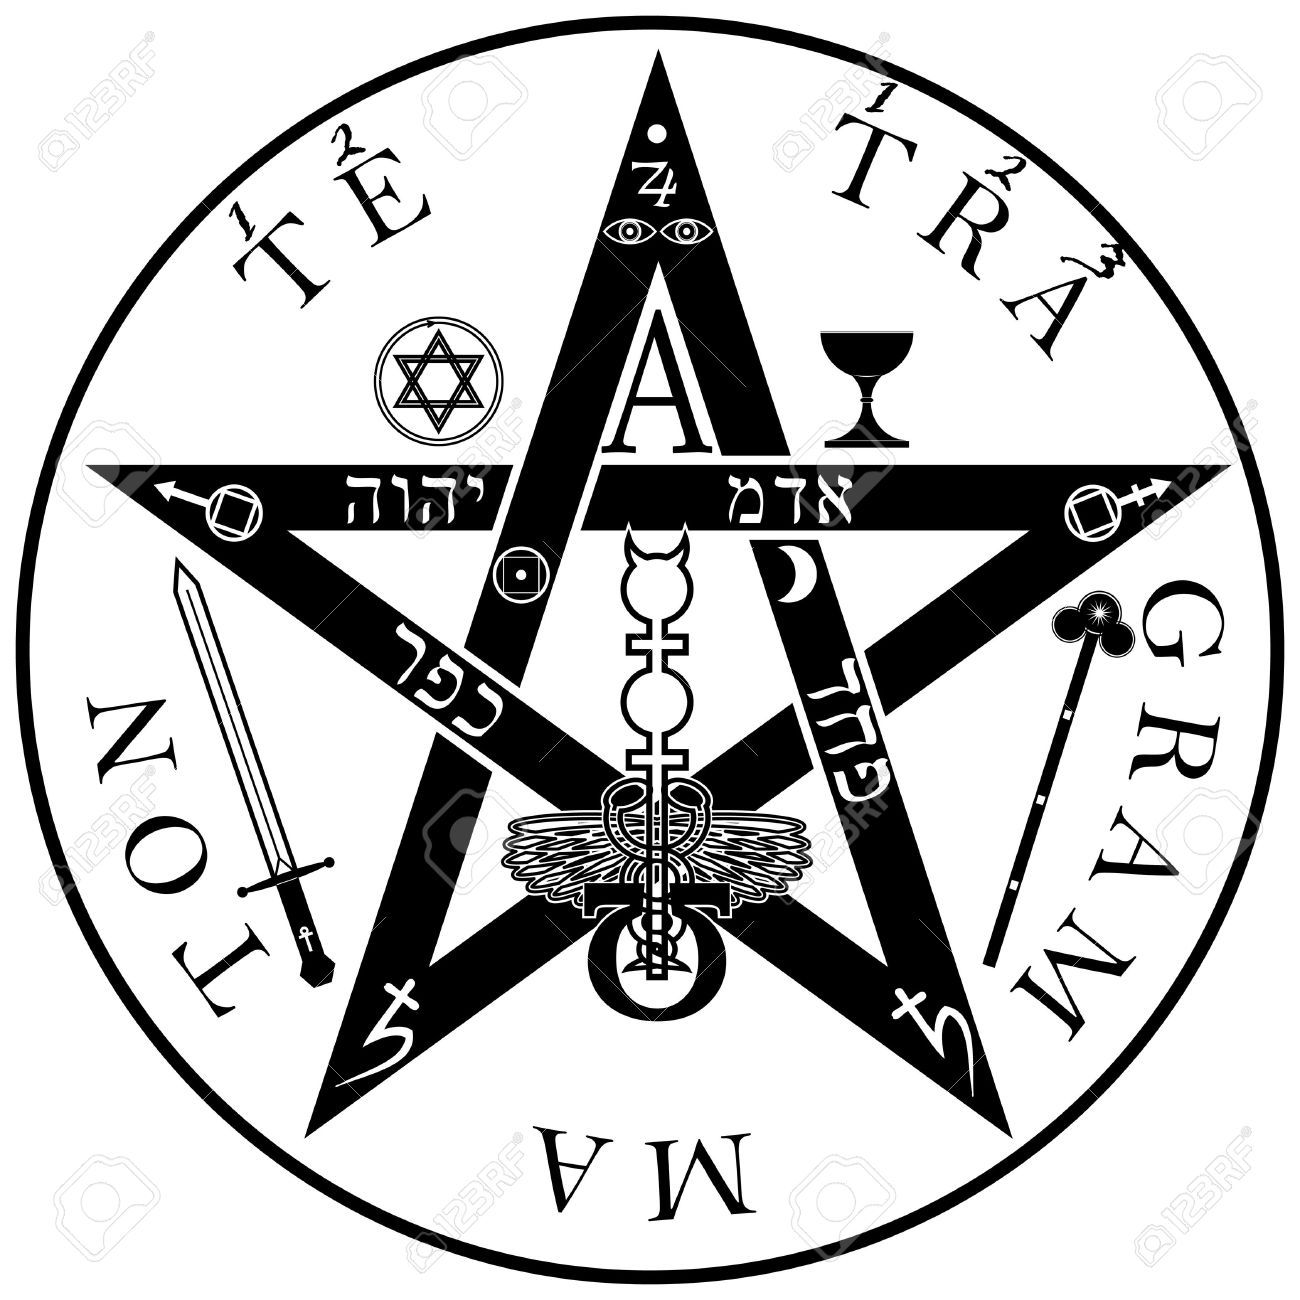 The ancient symbol tetragrammaton ineffable name of god the ancient symbol tetragrammaton ineffable name of god buycottarizona Image collections